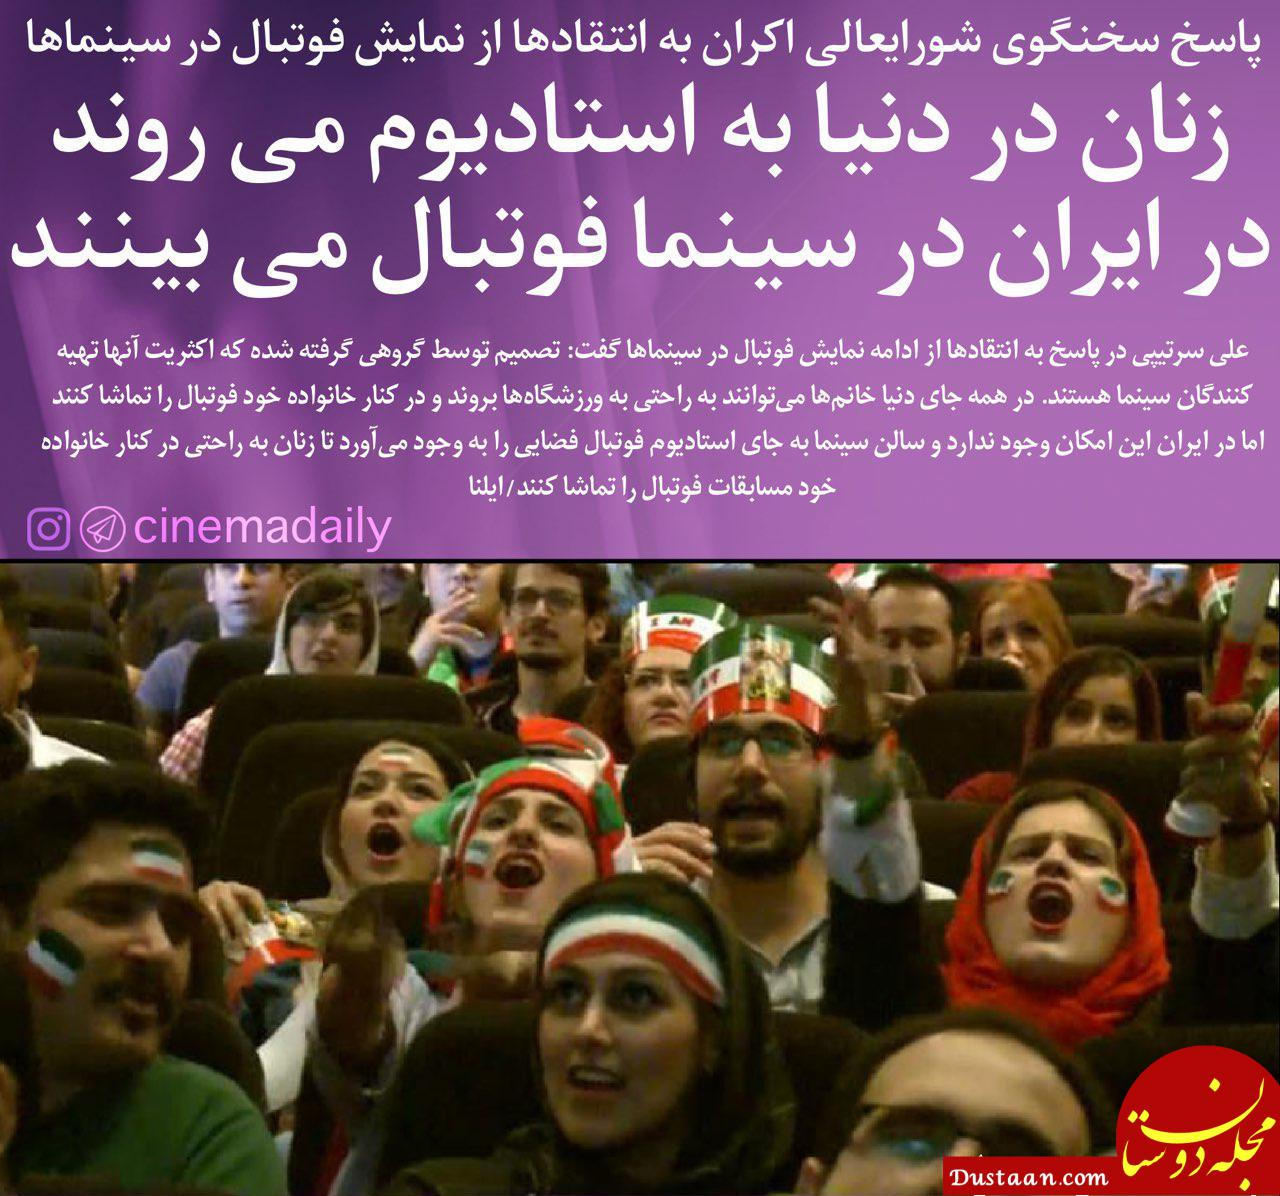 www.dustaan.com زنان در دنیا به استادیوم می روند، در ایران در سینما فوتبال می بینند